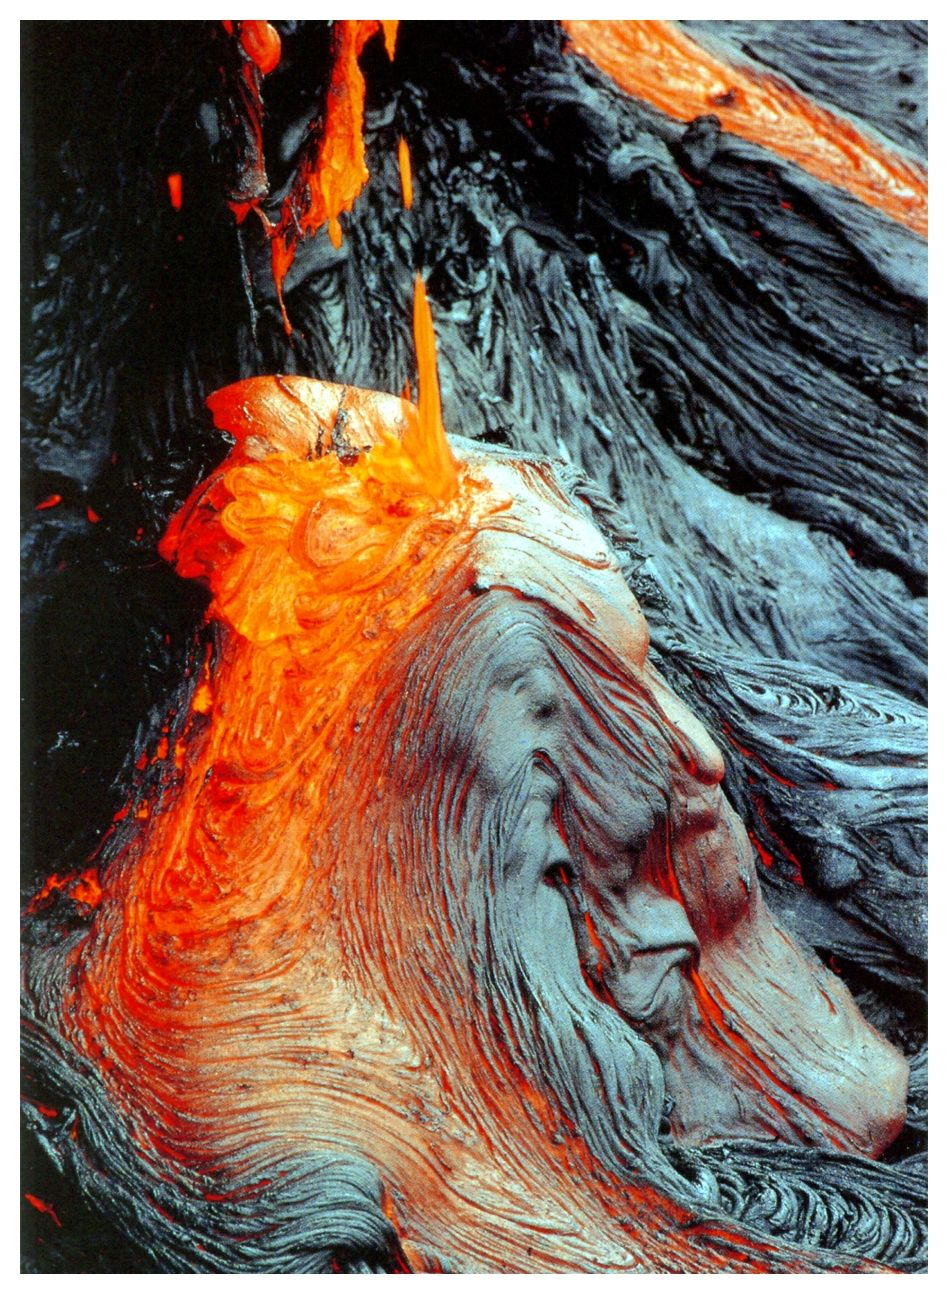 hawaii volcanoes national park powerful nature ii